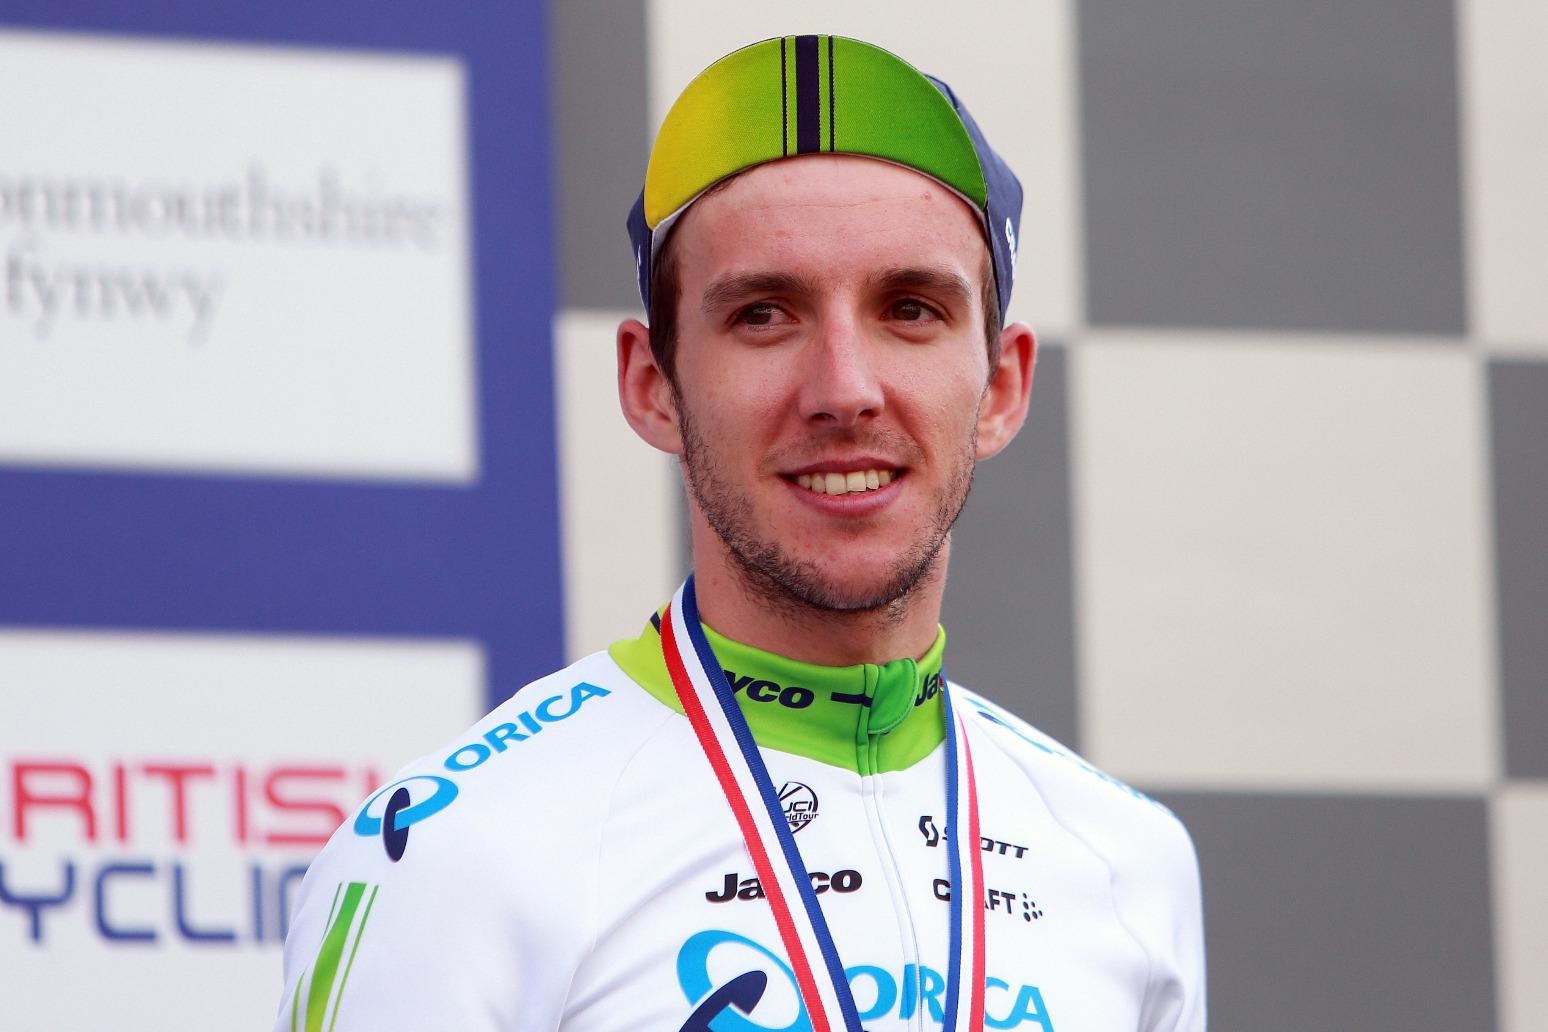 Simon Yates setting sights on Giro d'Italia victory